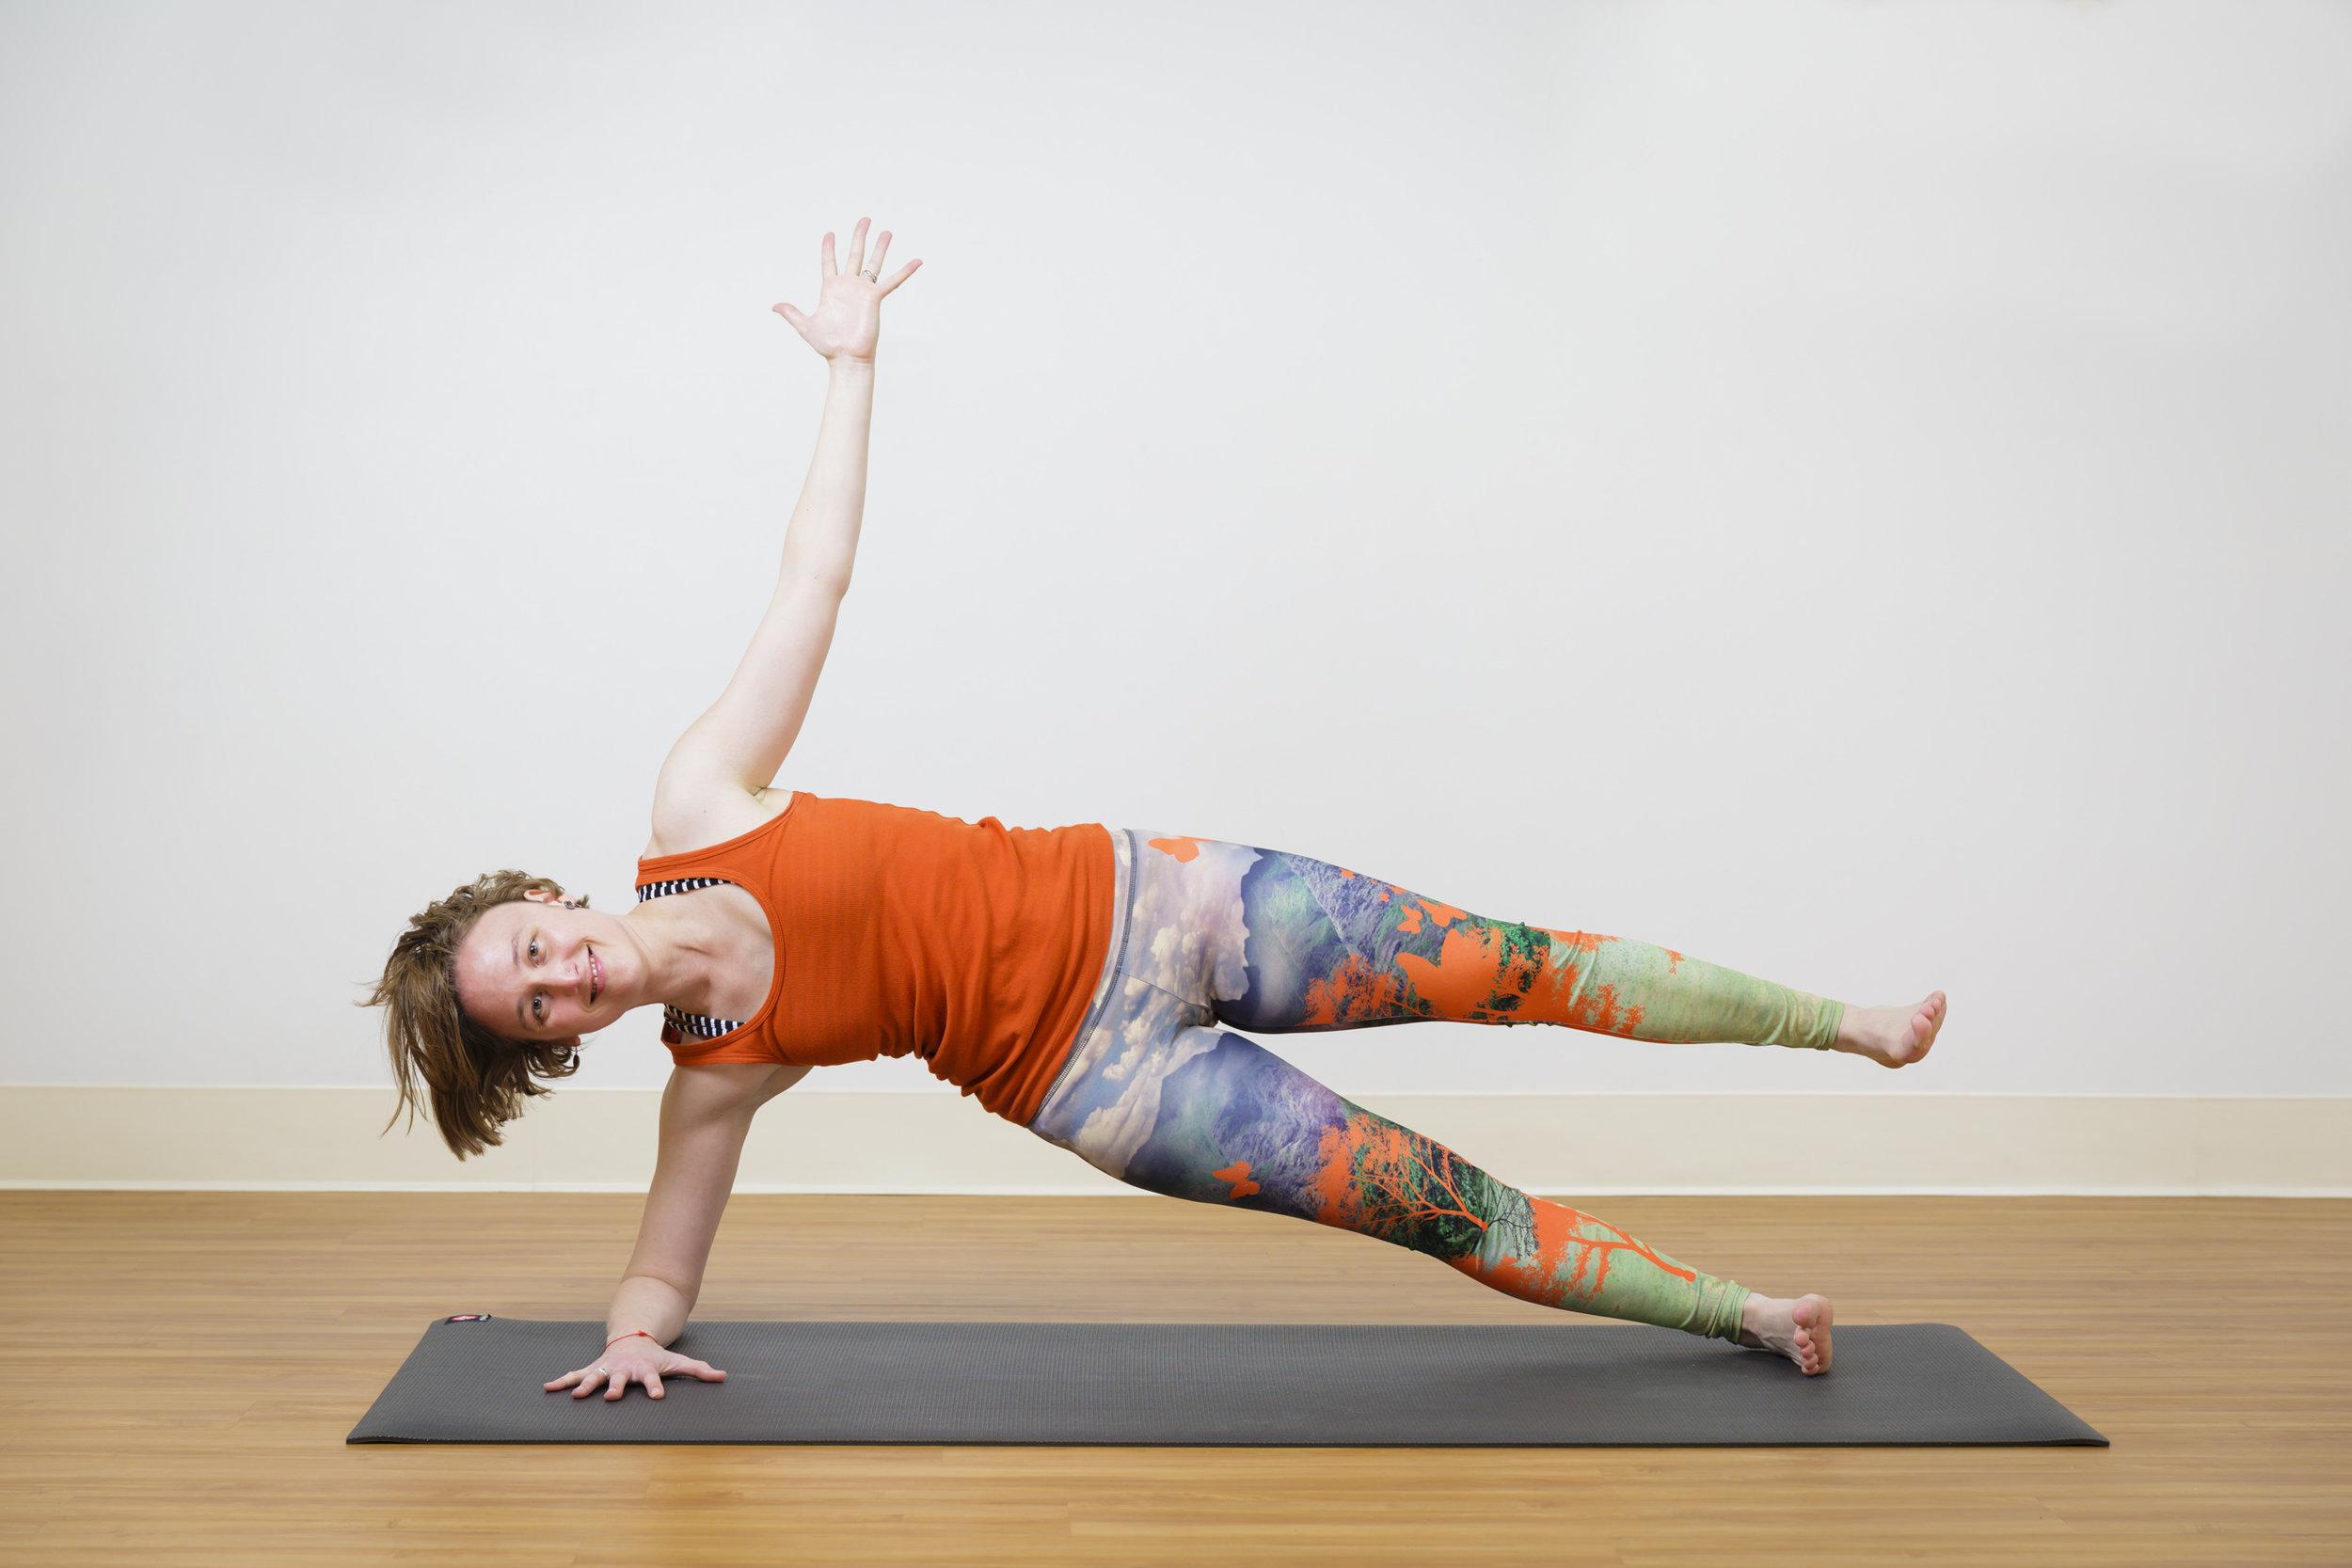 kerstin yoga advertisement.jpg